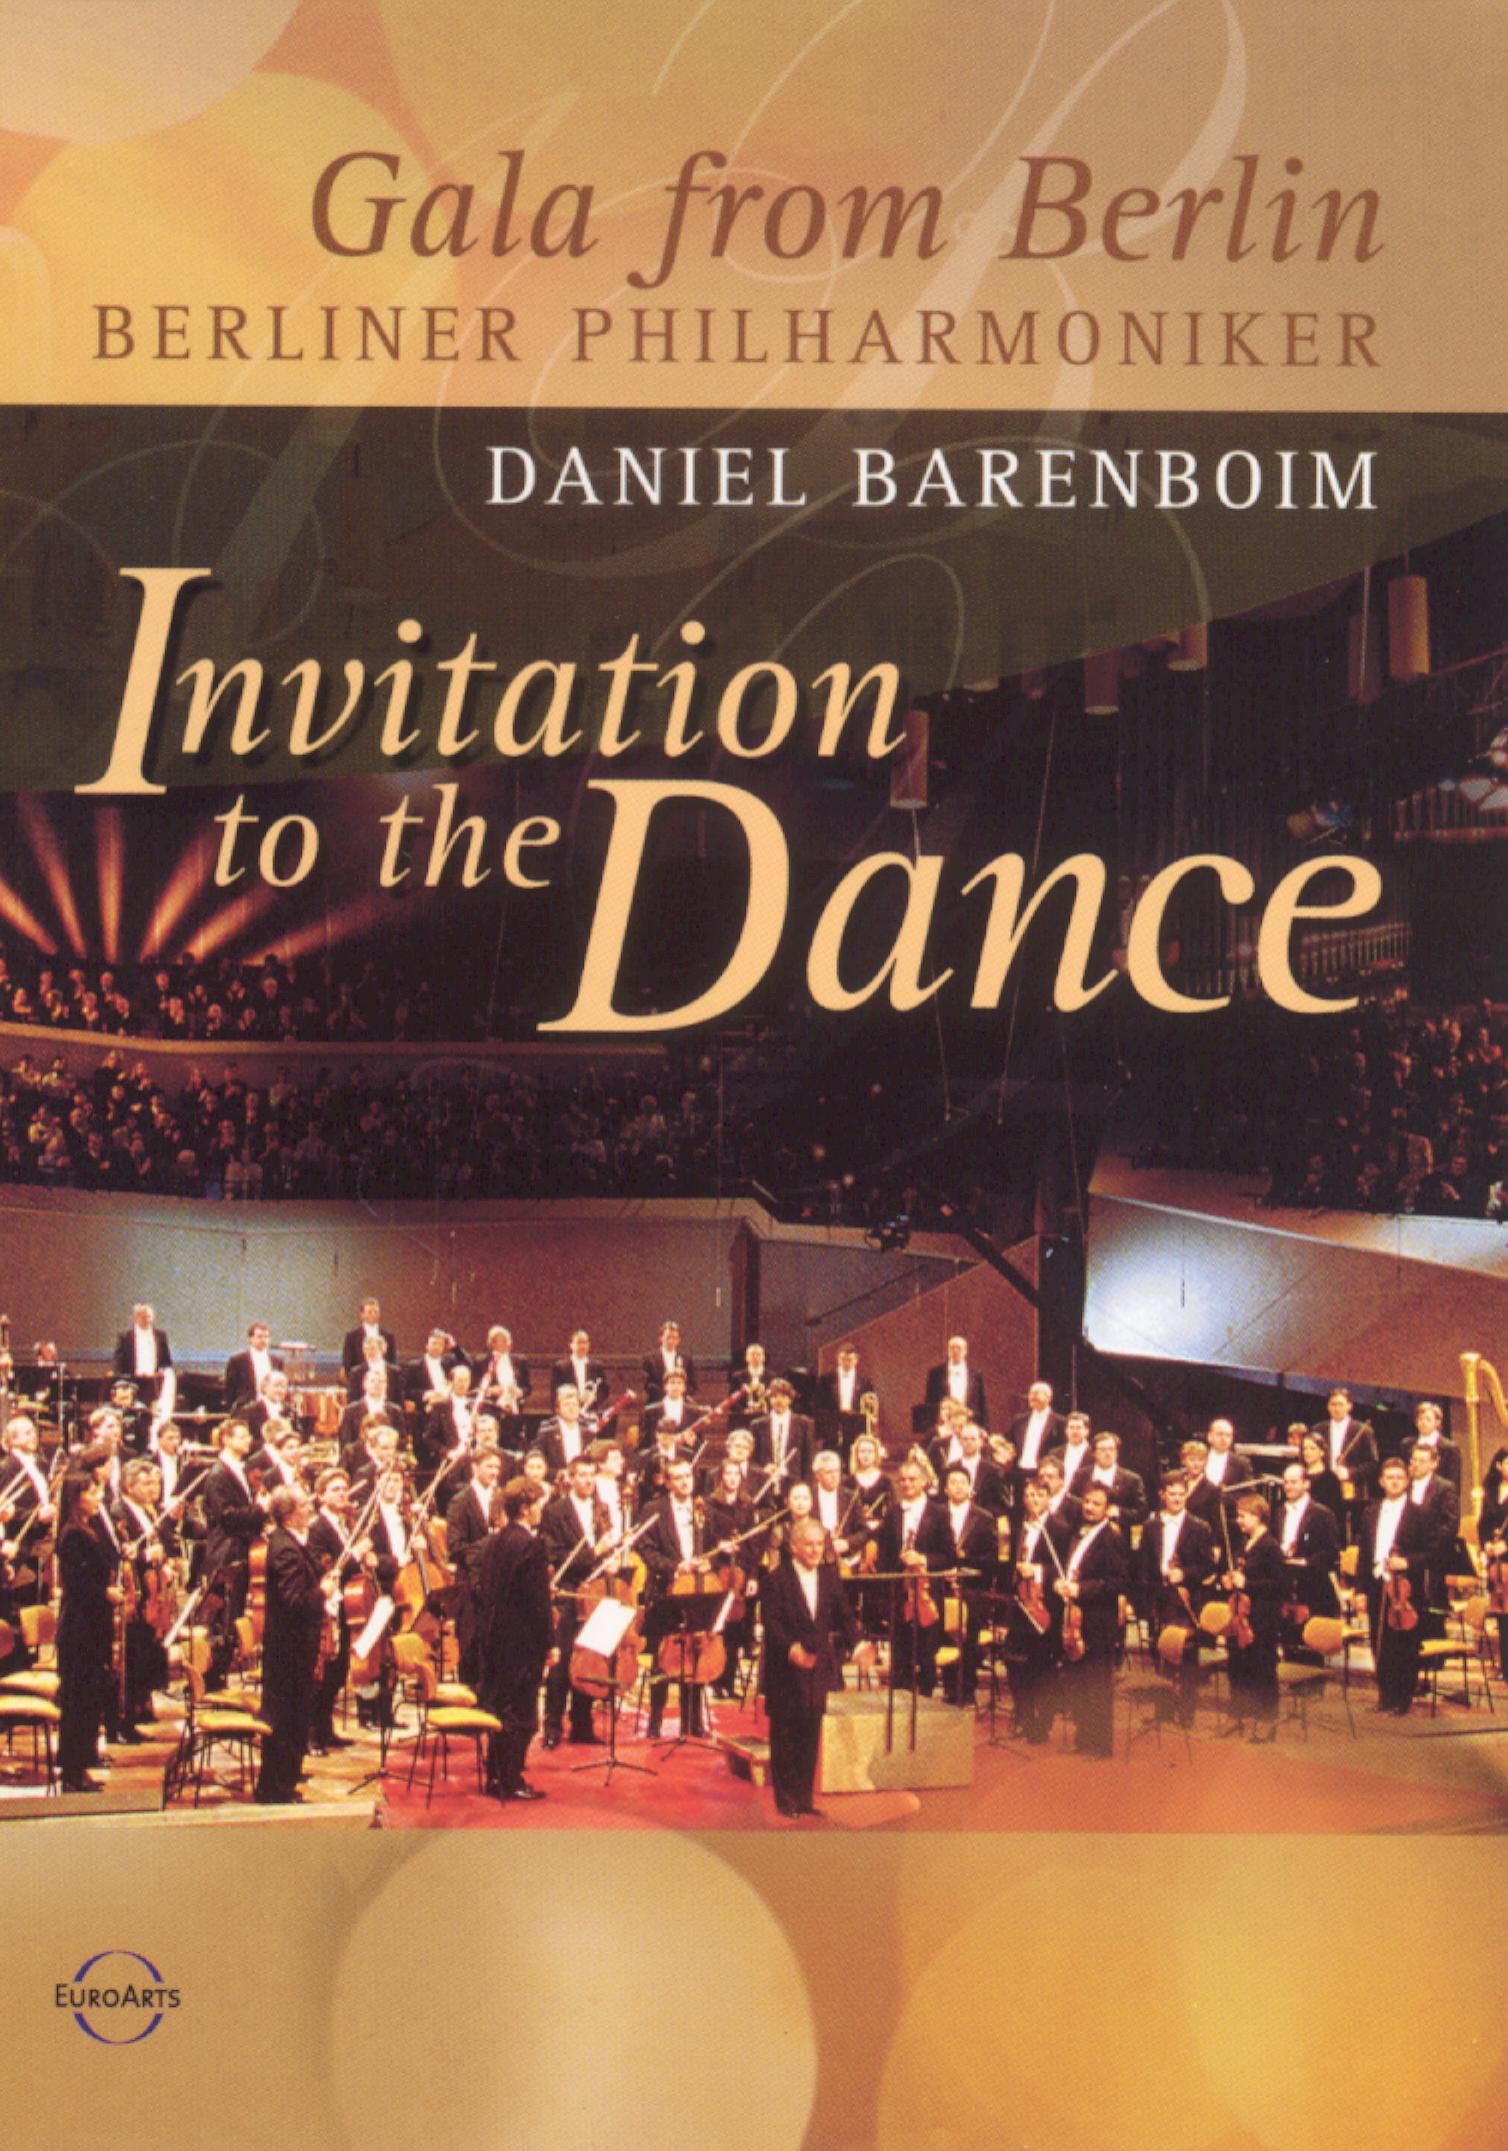 Daniel Barenboim: New Years Eve Concert 2001